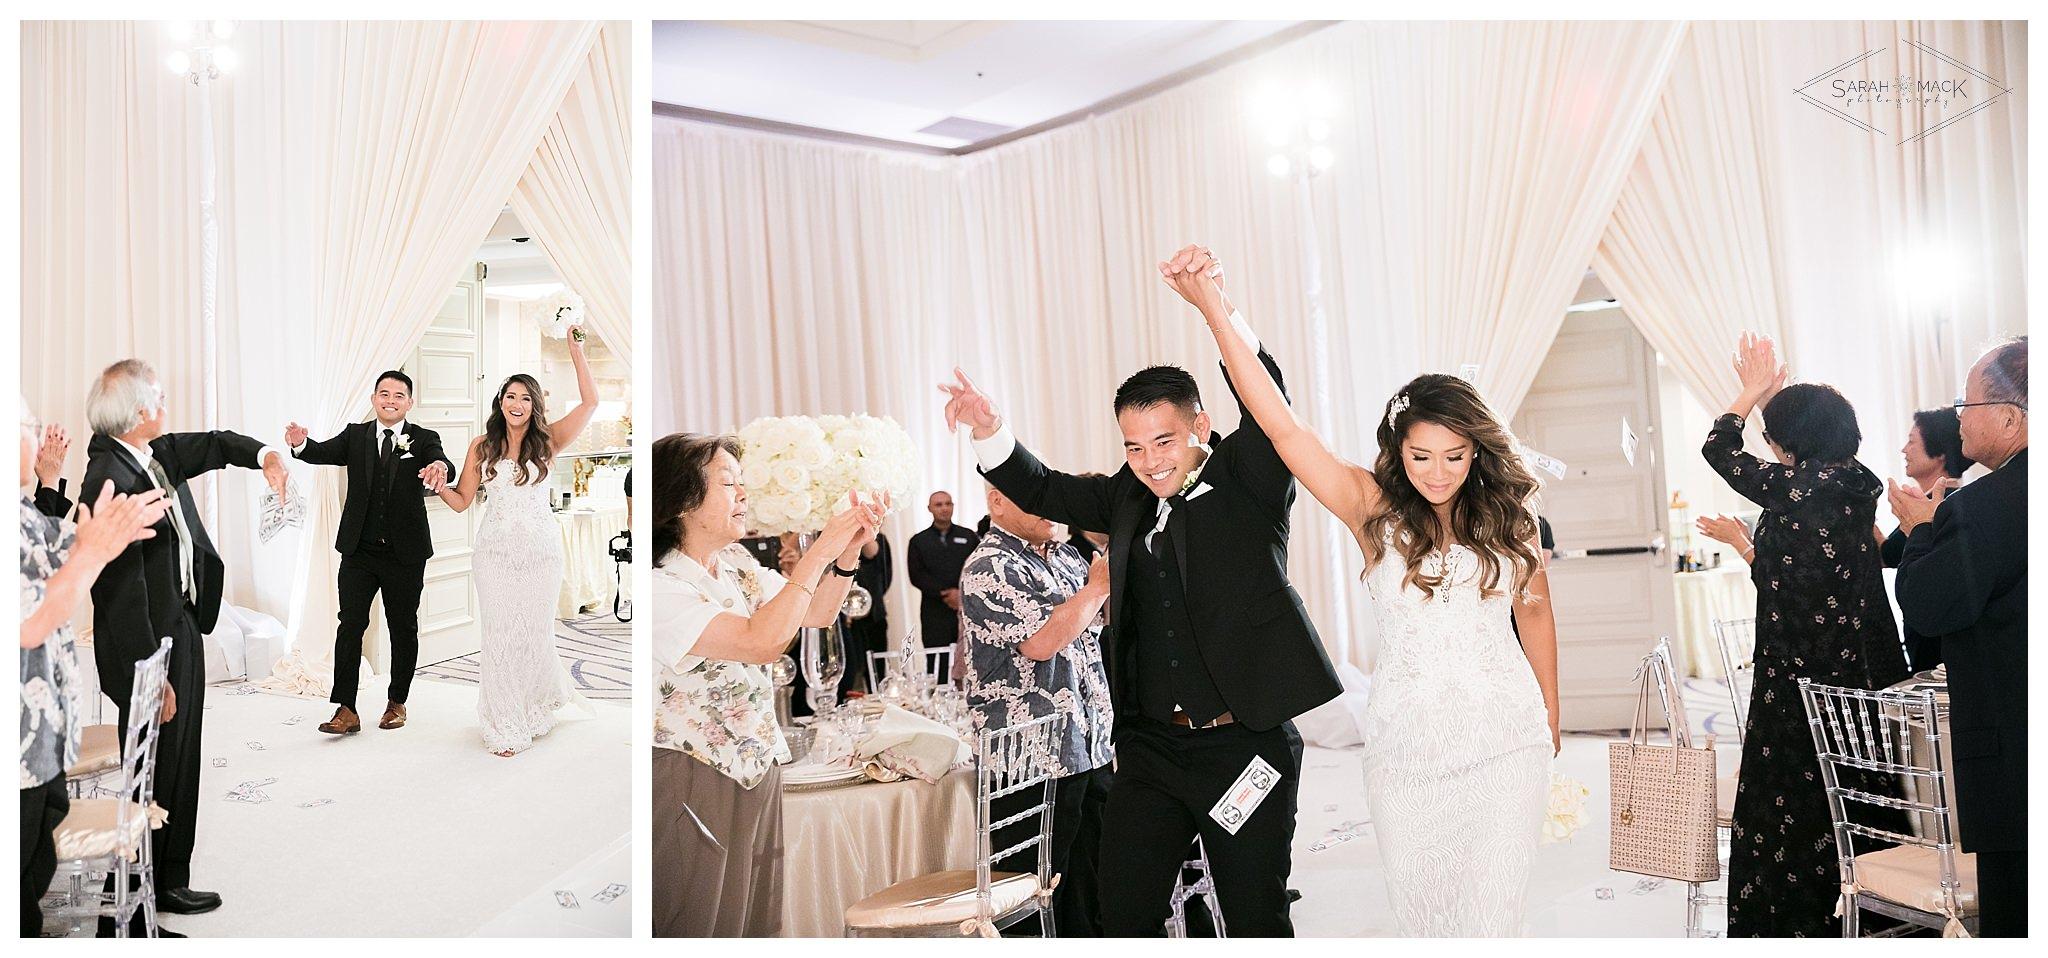 LE-Avenue-of-the-Arts-Costa-Mesa-Wedding-Photography-0182.jpg